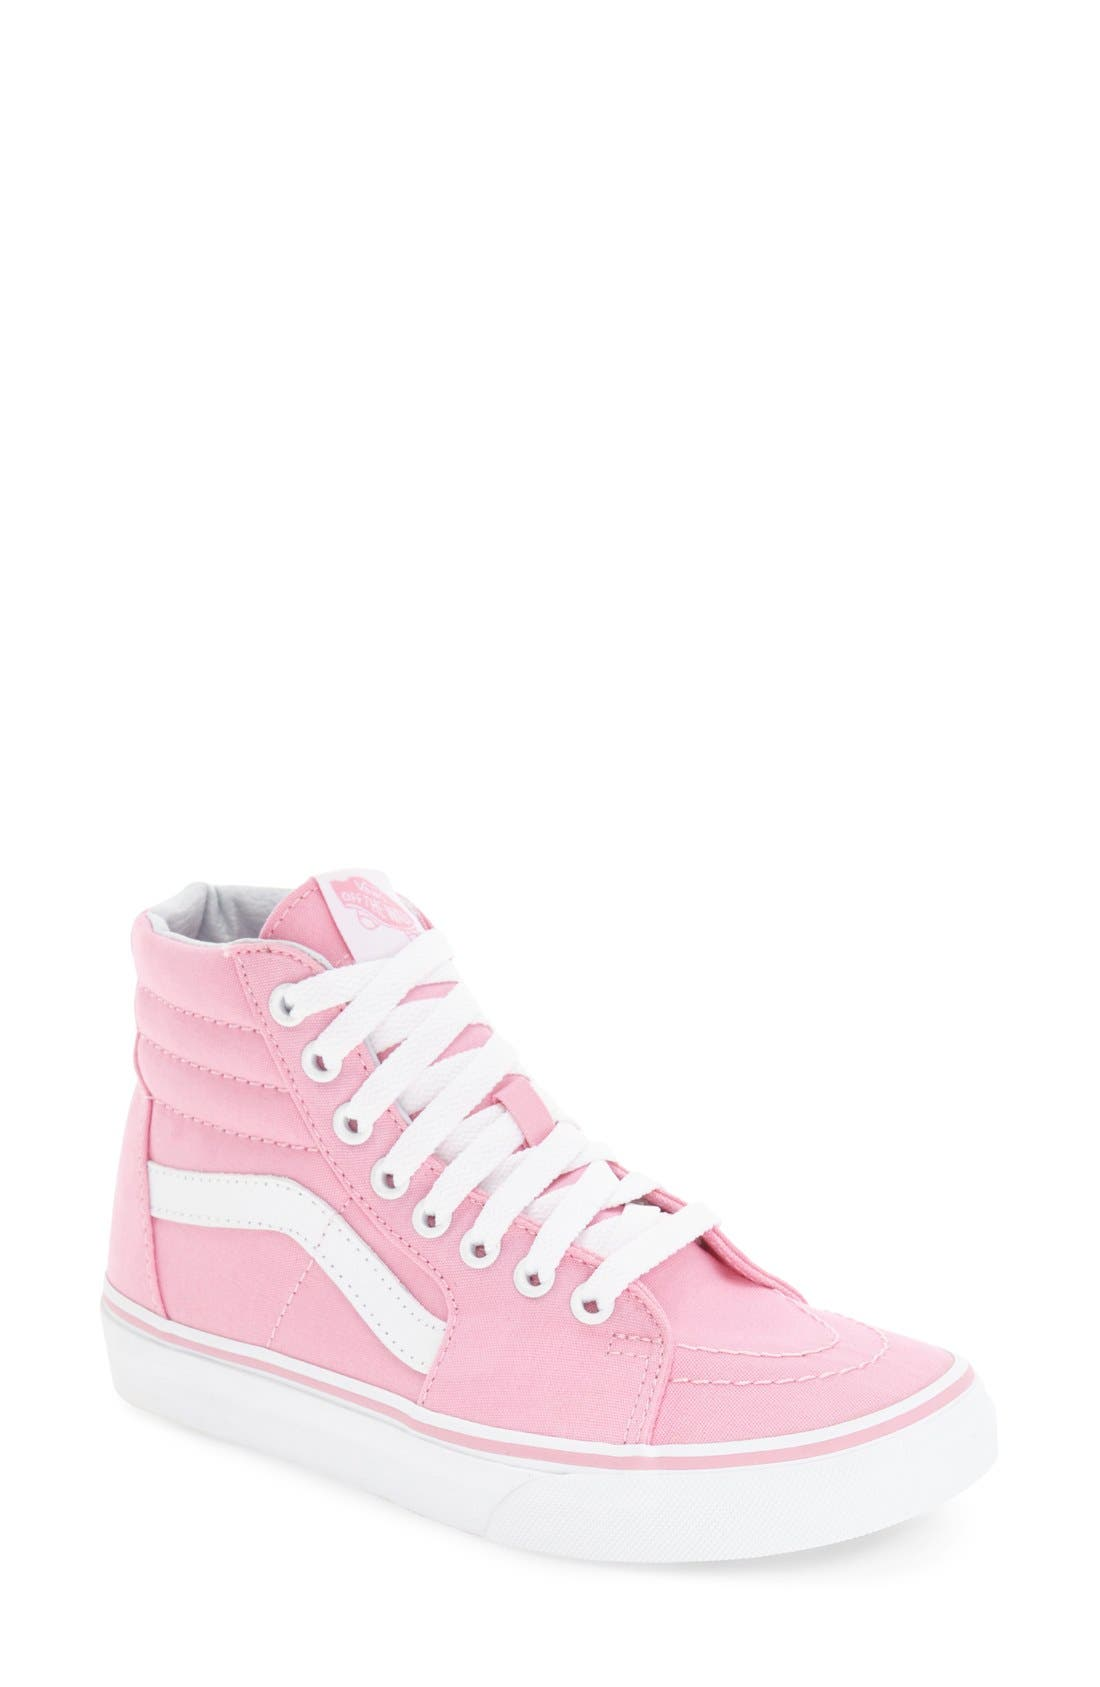 Alternate Image 1 Selected - Vans 'Sk8-Hi' Sneaker (Women)